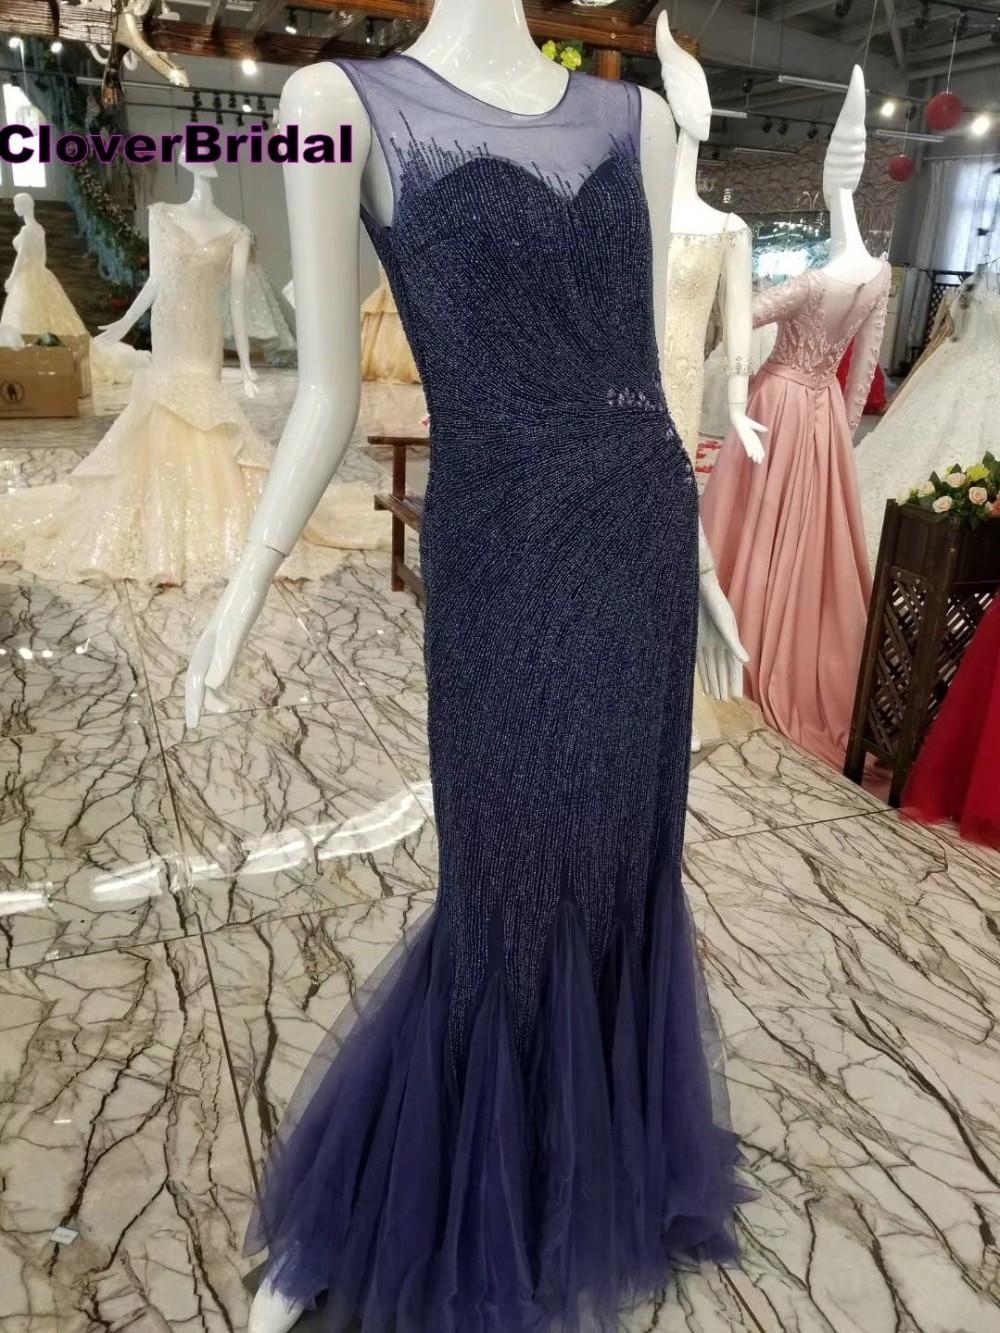 CloverBridal Azul marino sin mangas vaina de lujo vestidos de fiesta largos elegantes de gala Sleeveless Navy blue evening gown